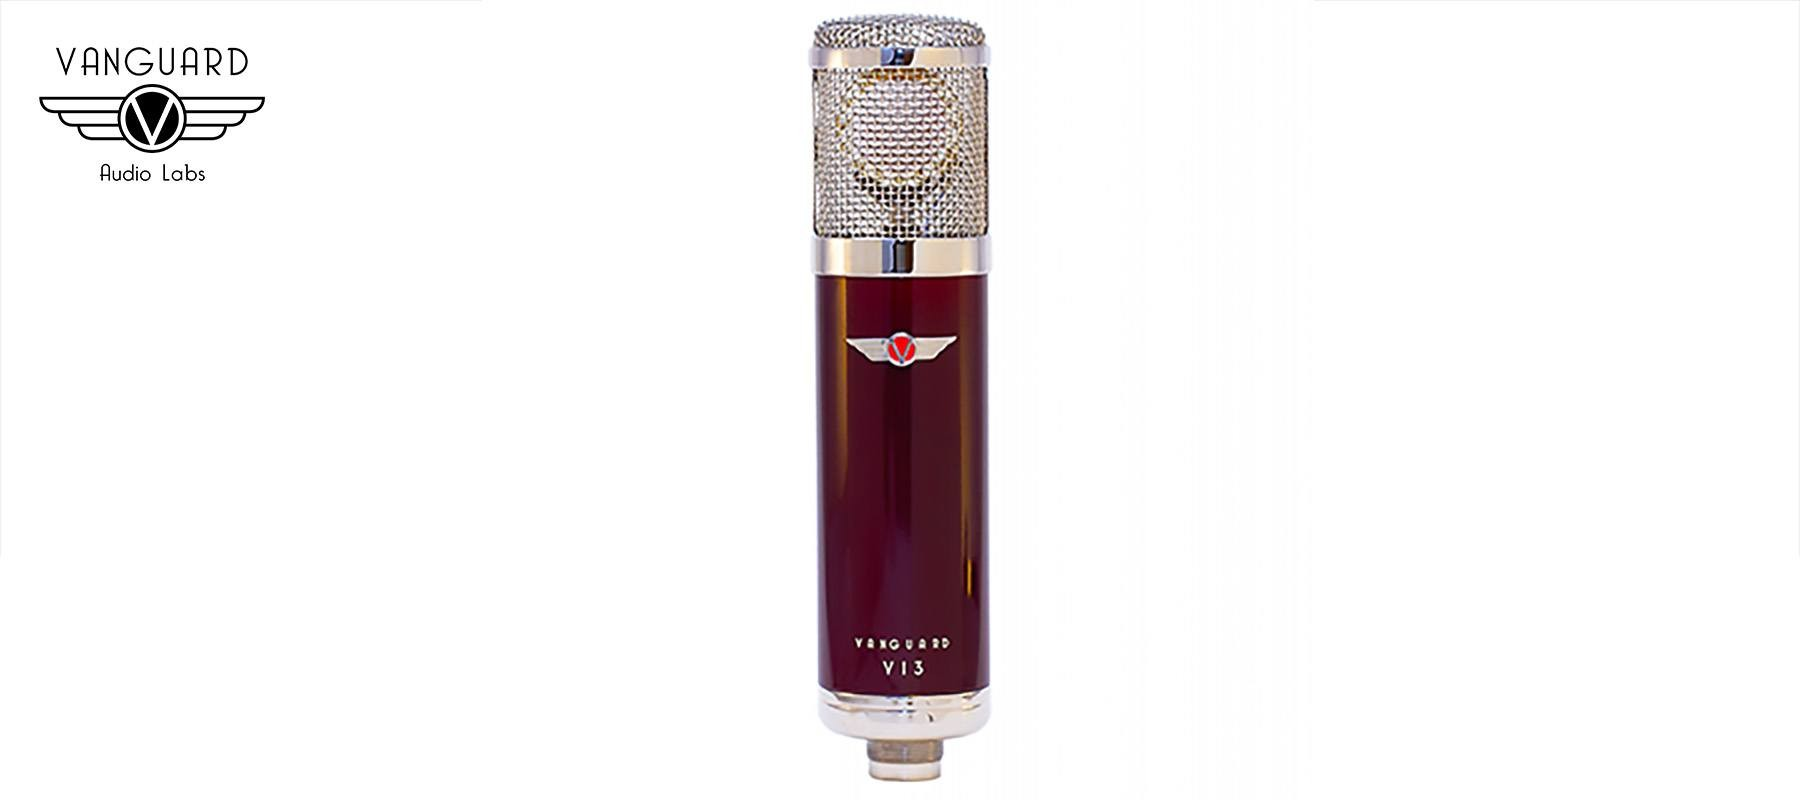 Vanguard Audio V13 - Avant